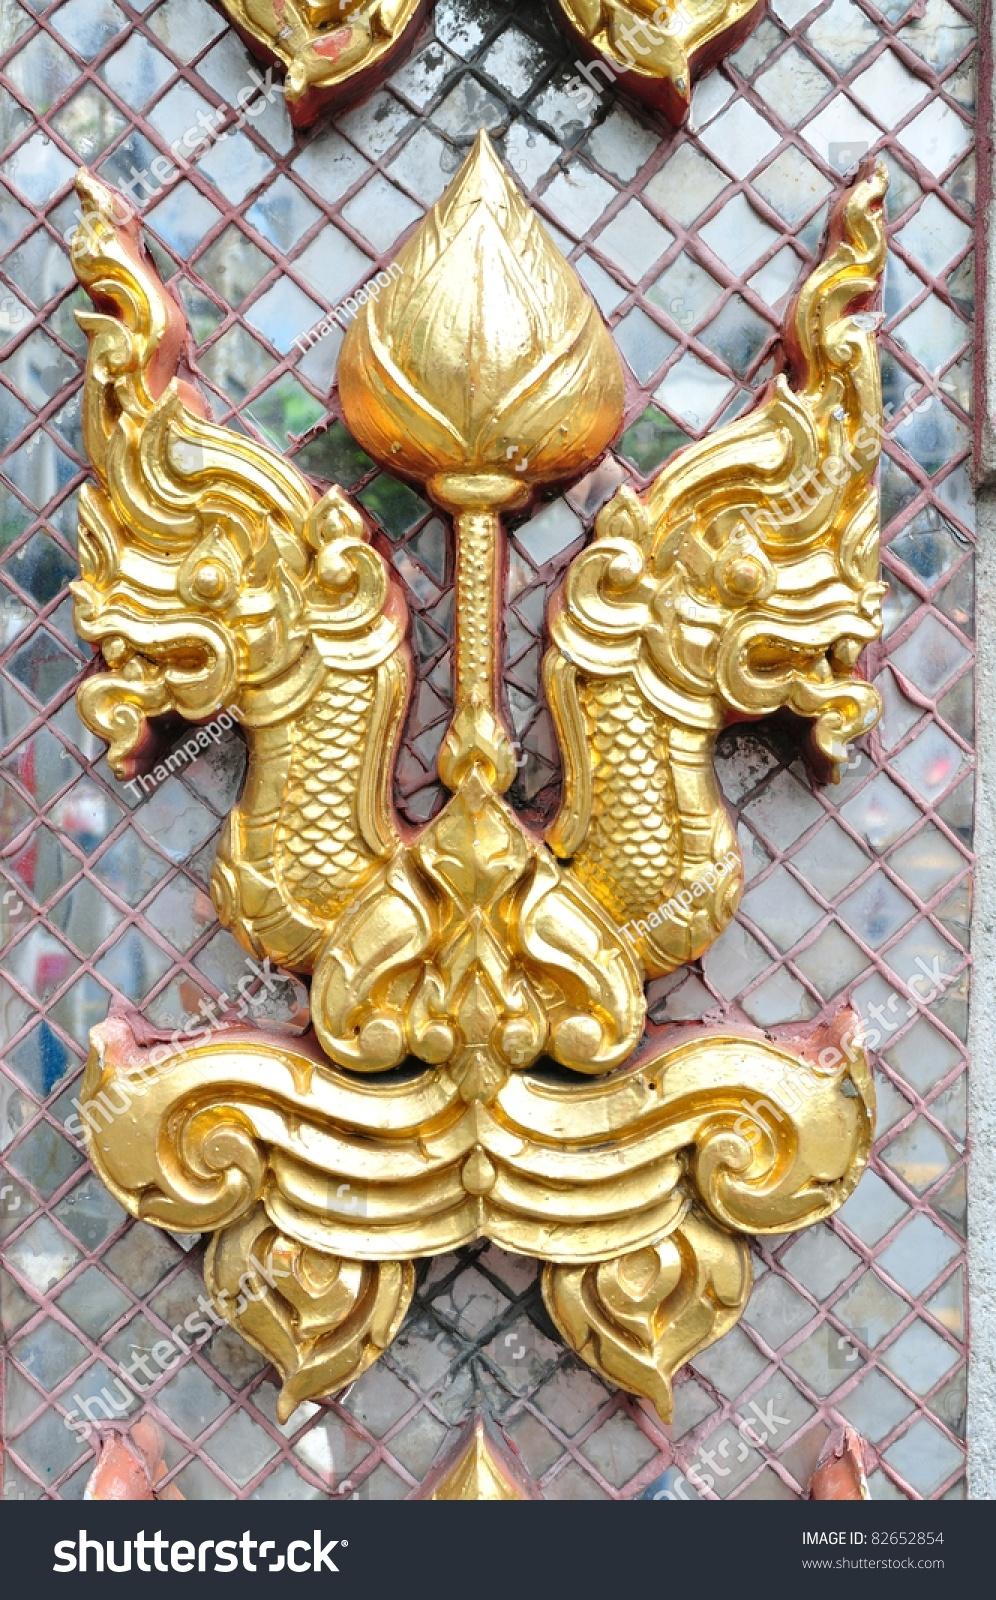 Golden Naga Head On Decorated Mirror Stock Photo (Royalty Free ...